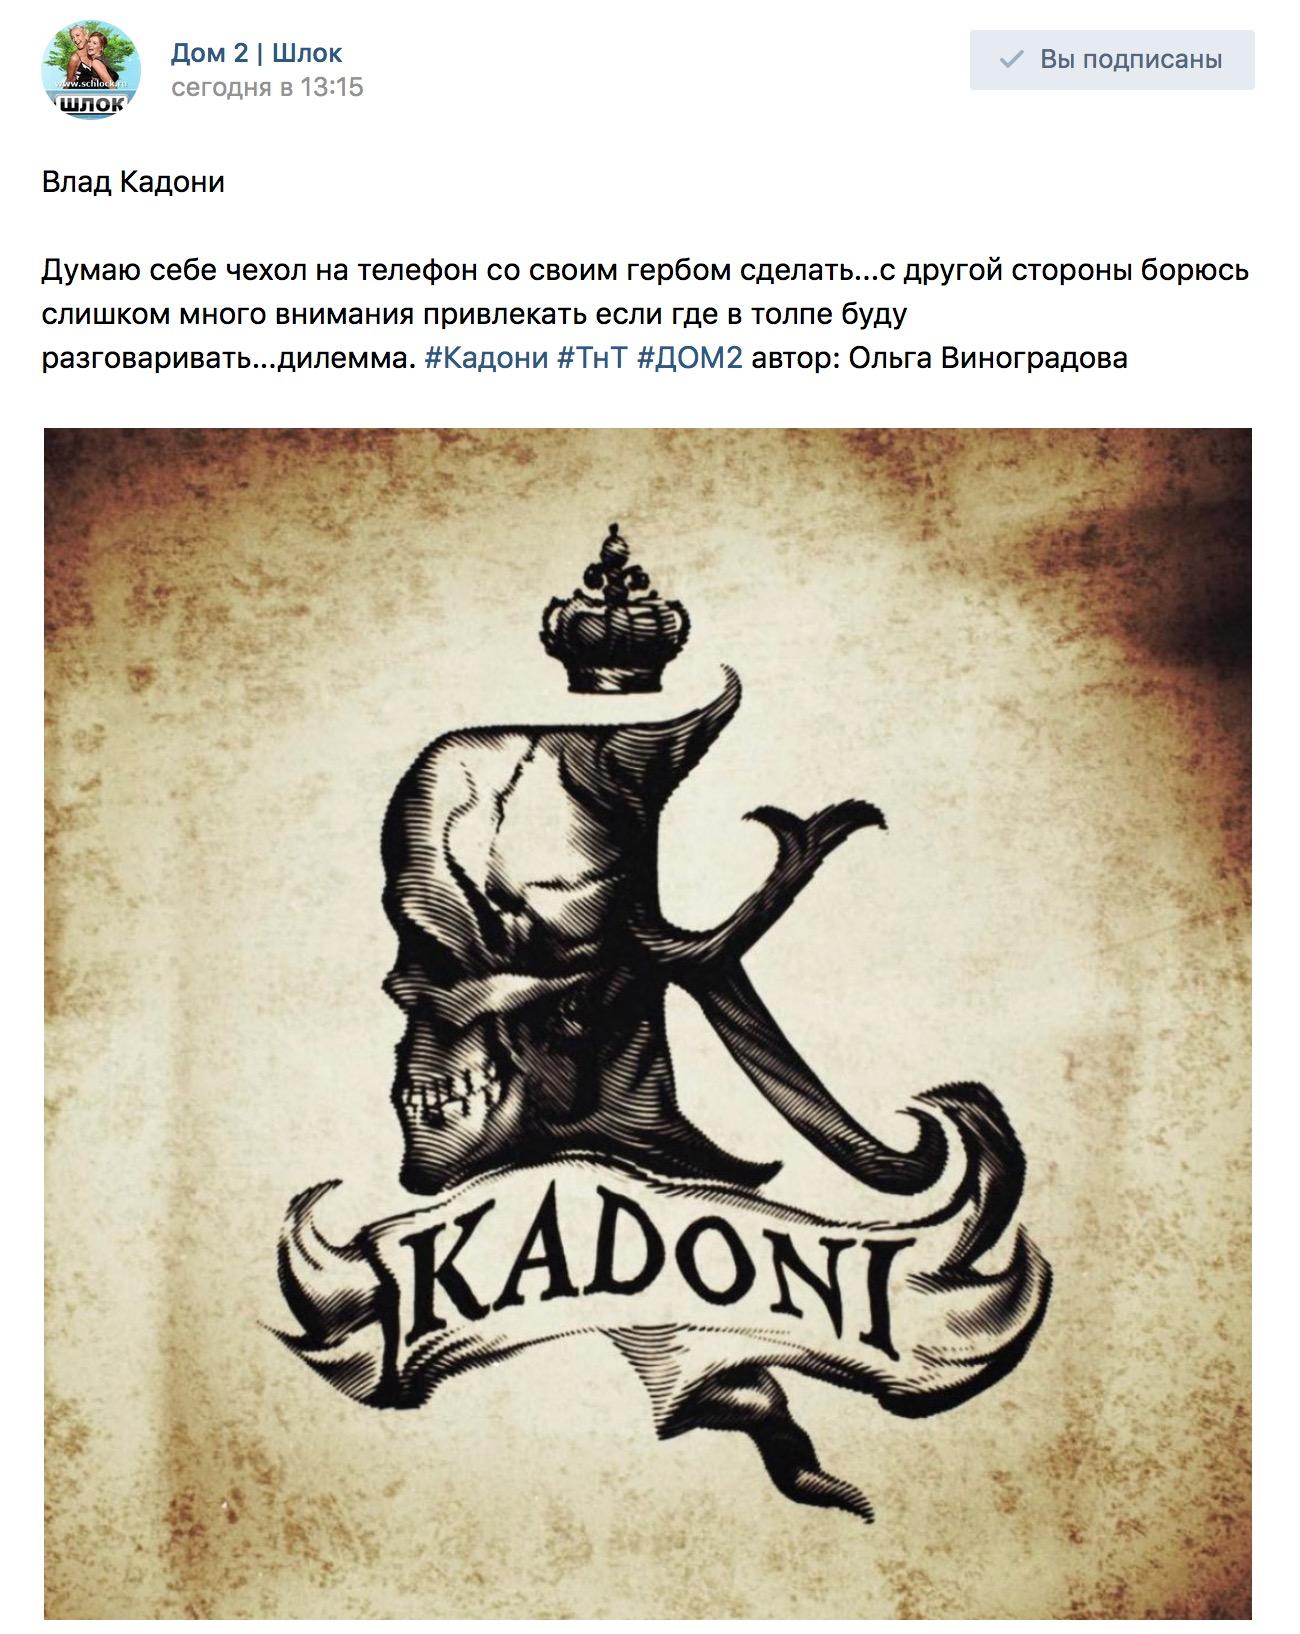 Герб Влада Кадони